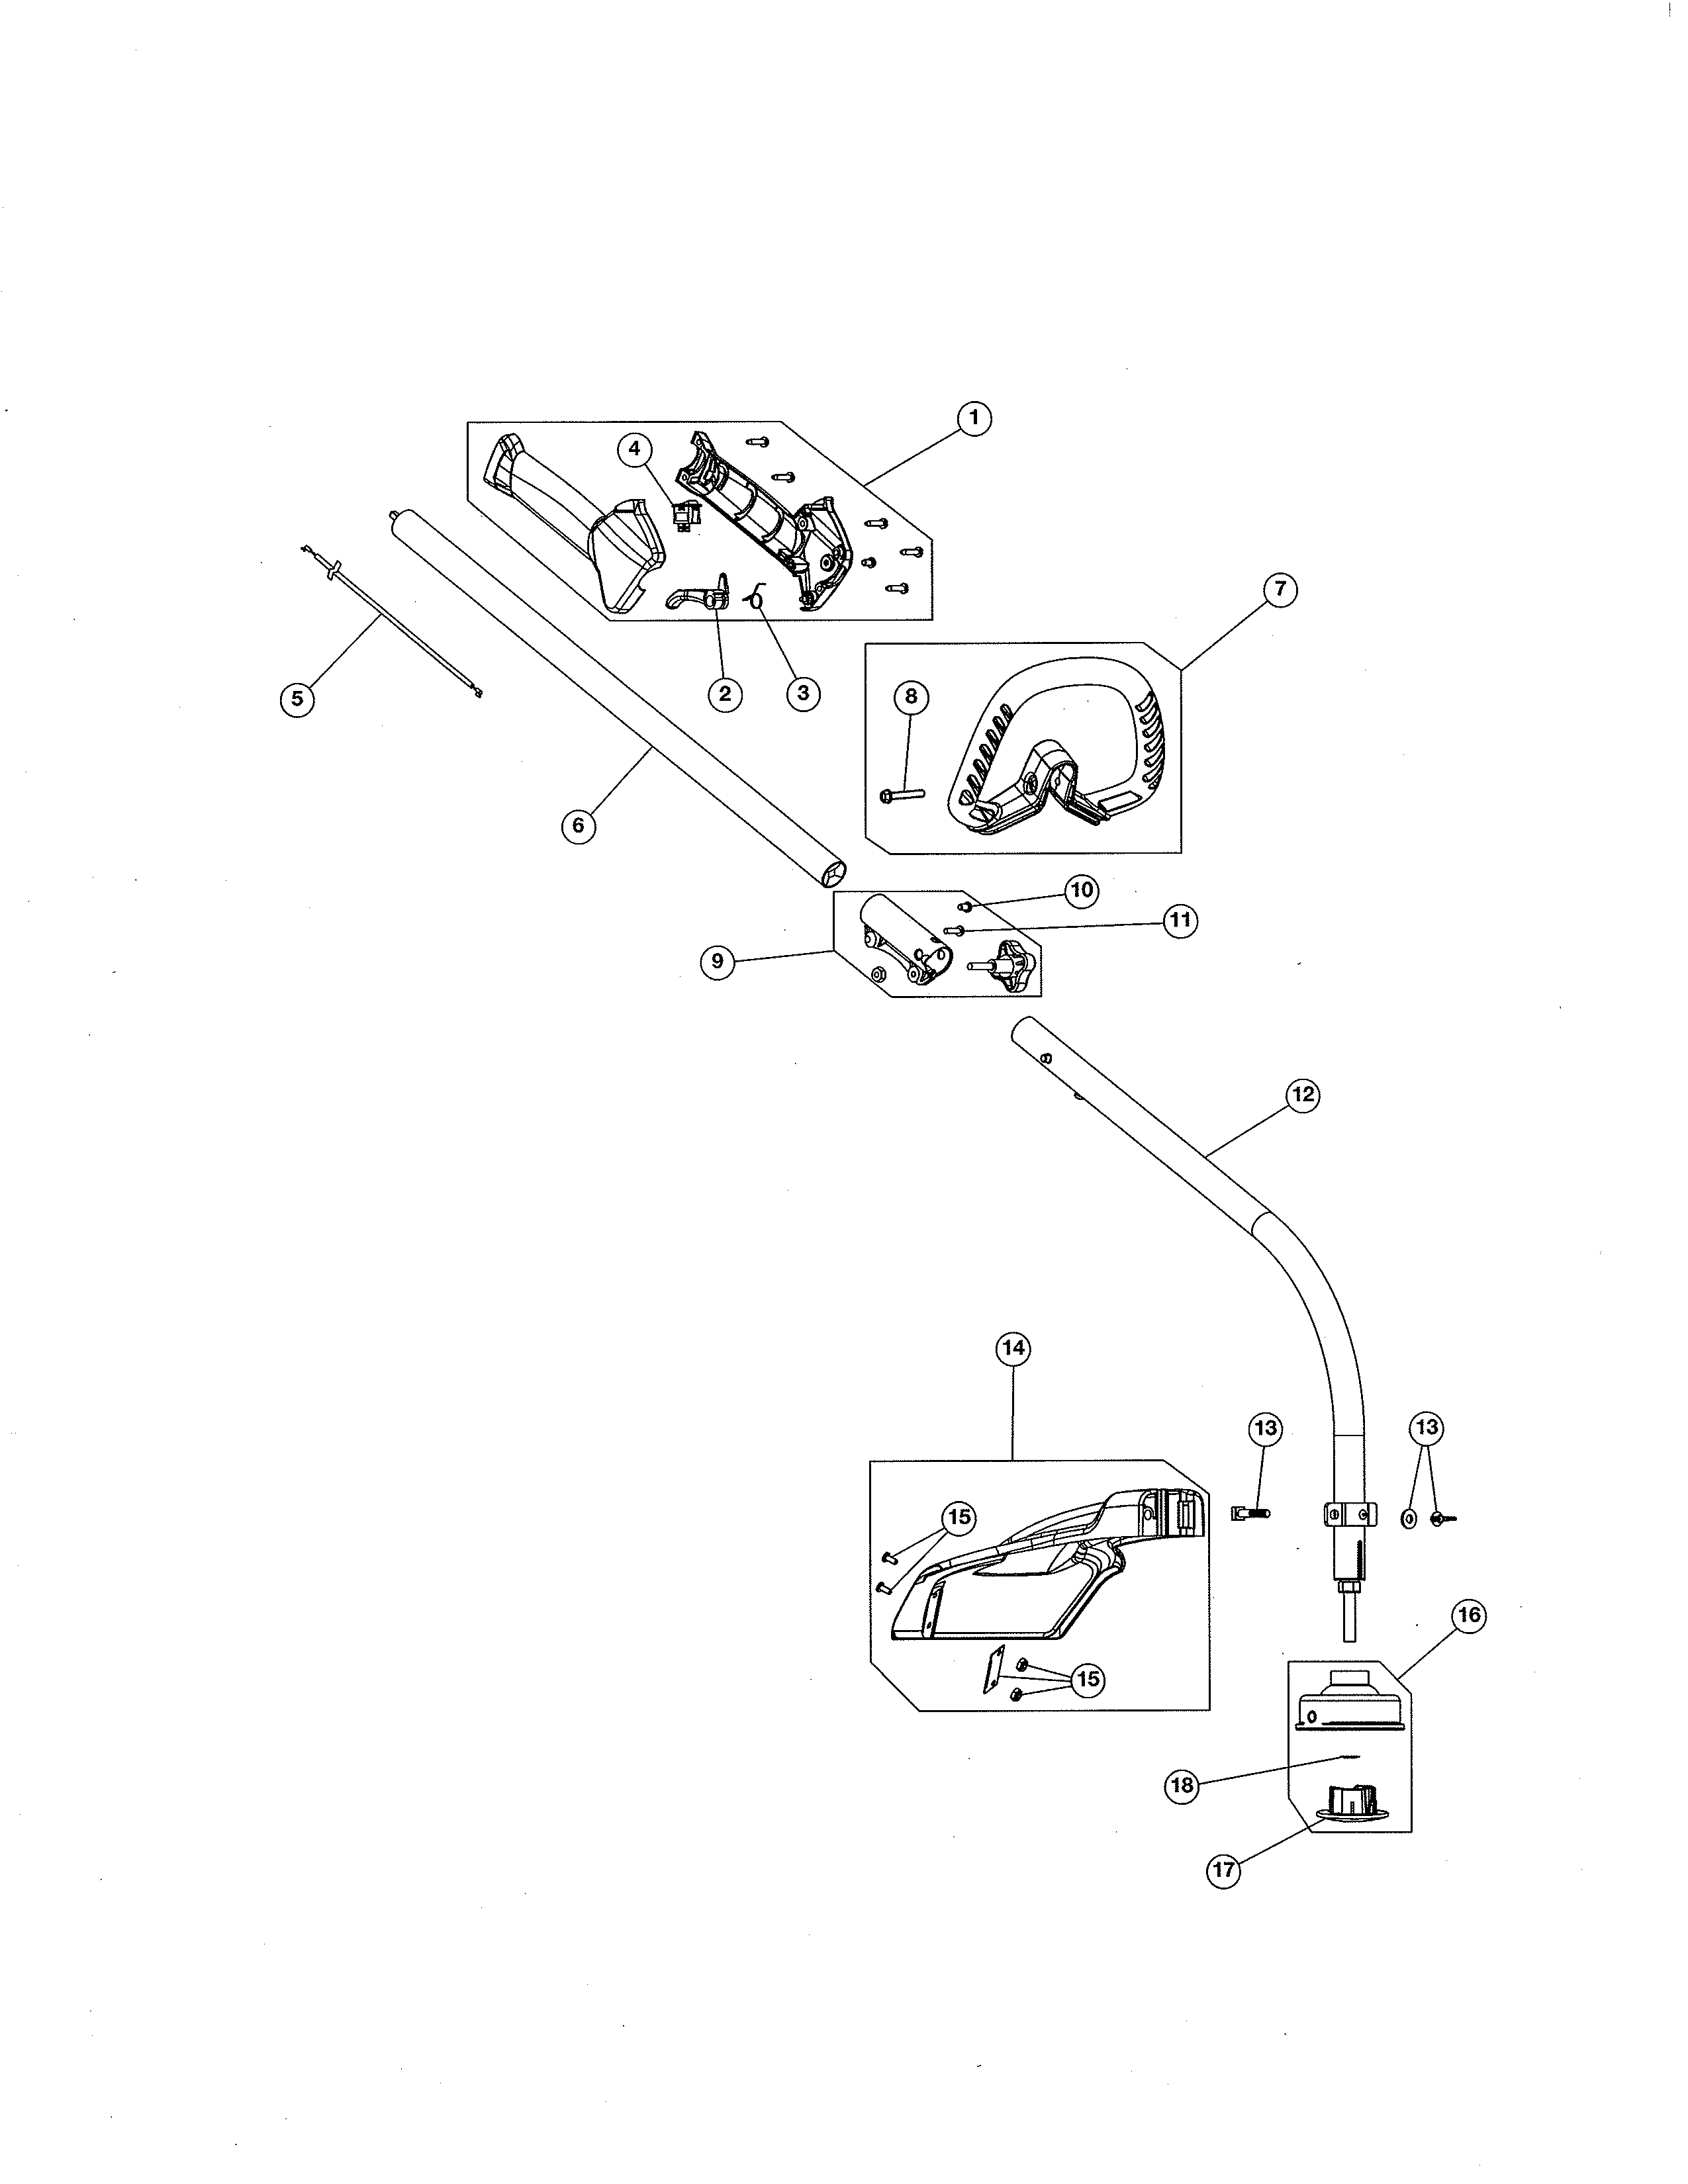 mtd gas trimmer model 41adz45c799 drive shaft handle shield parts diagram [ 2550 x 3300 Pixel ]